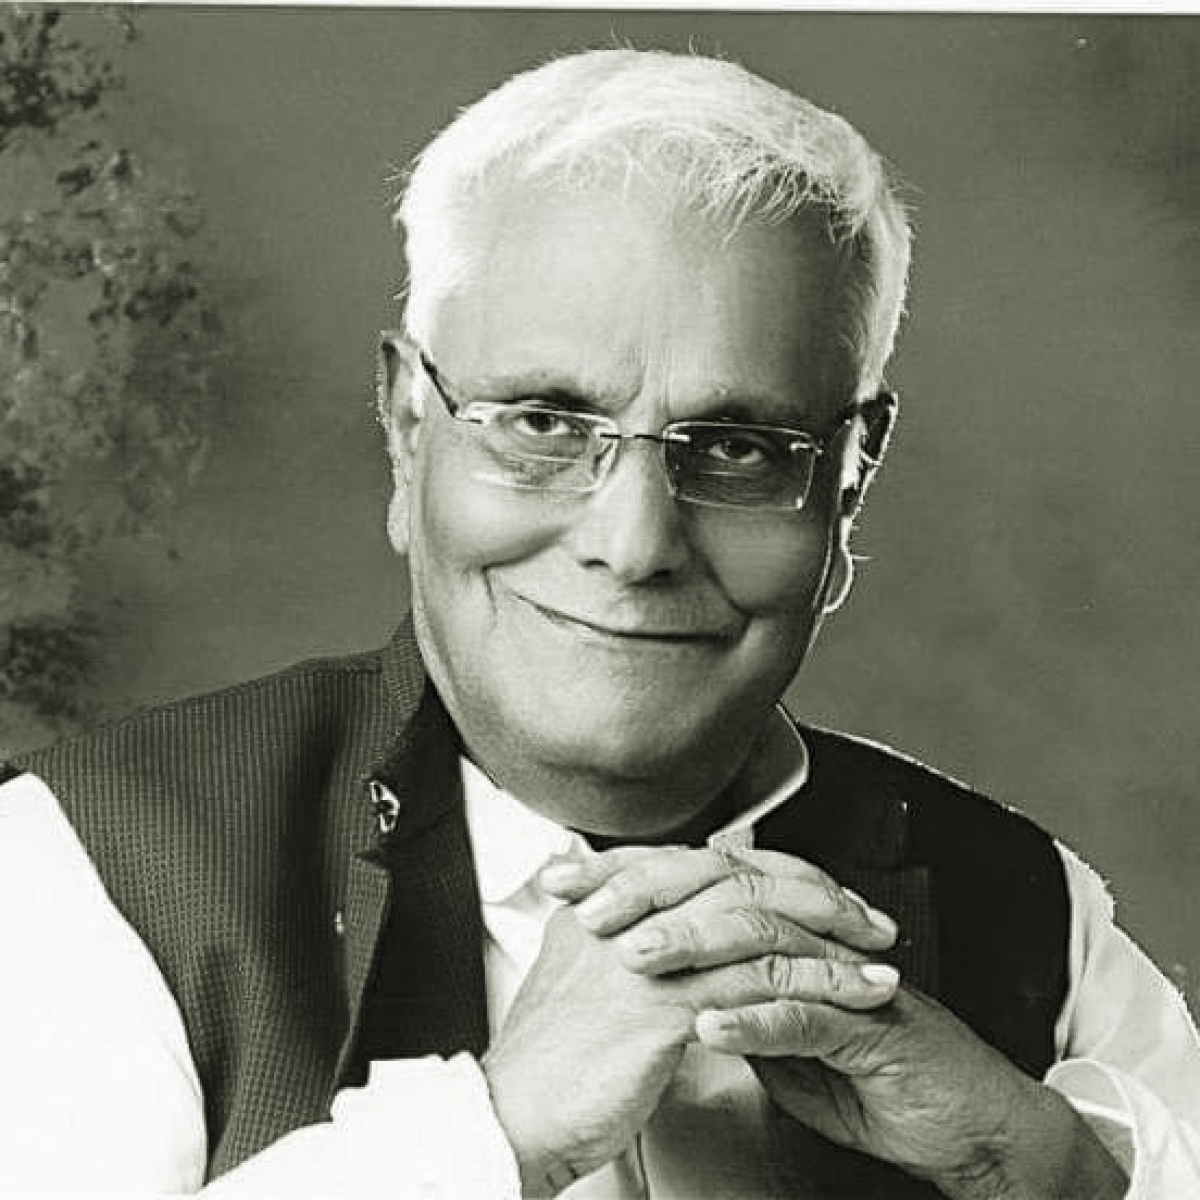 BJP's Kailash Sarang passes away: PM Modi pays tribute to veteran leader